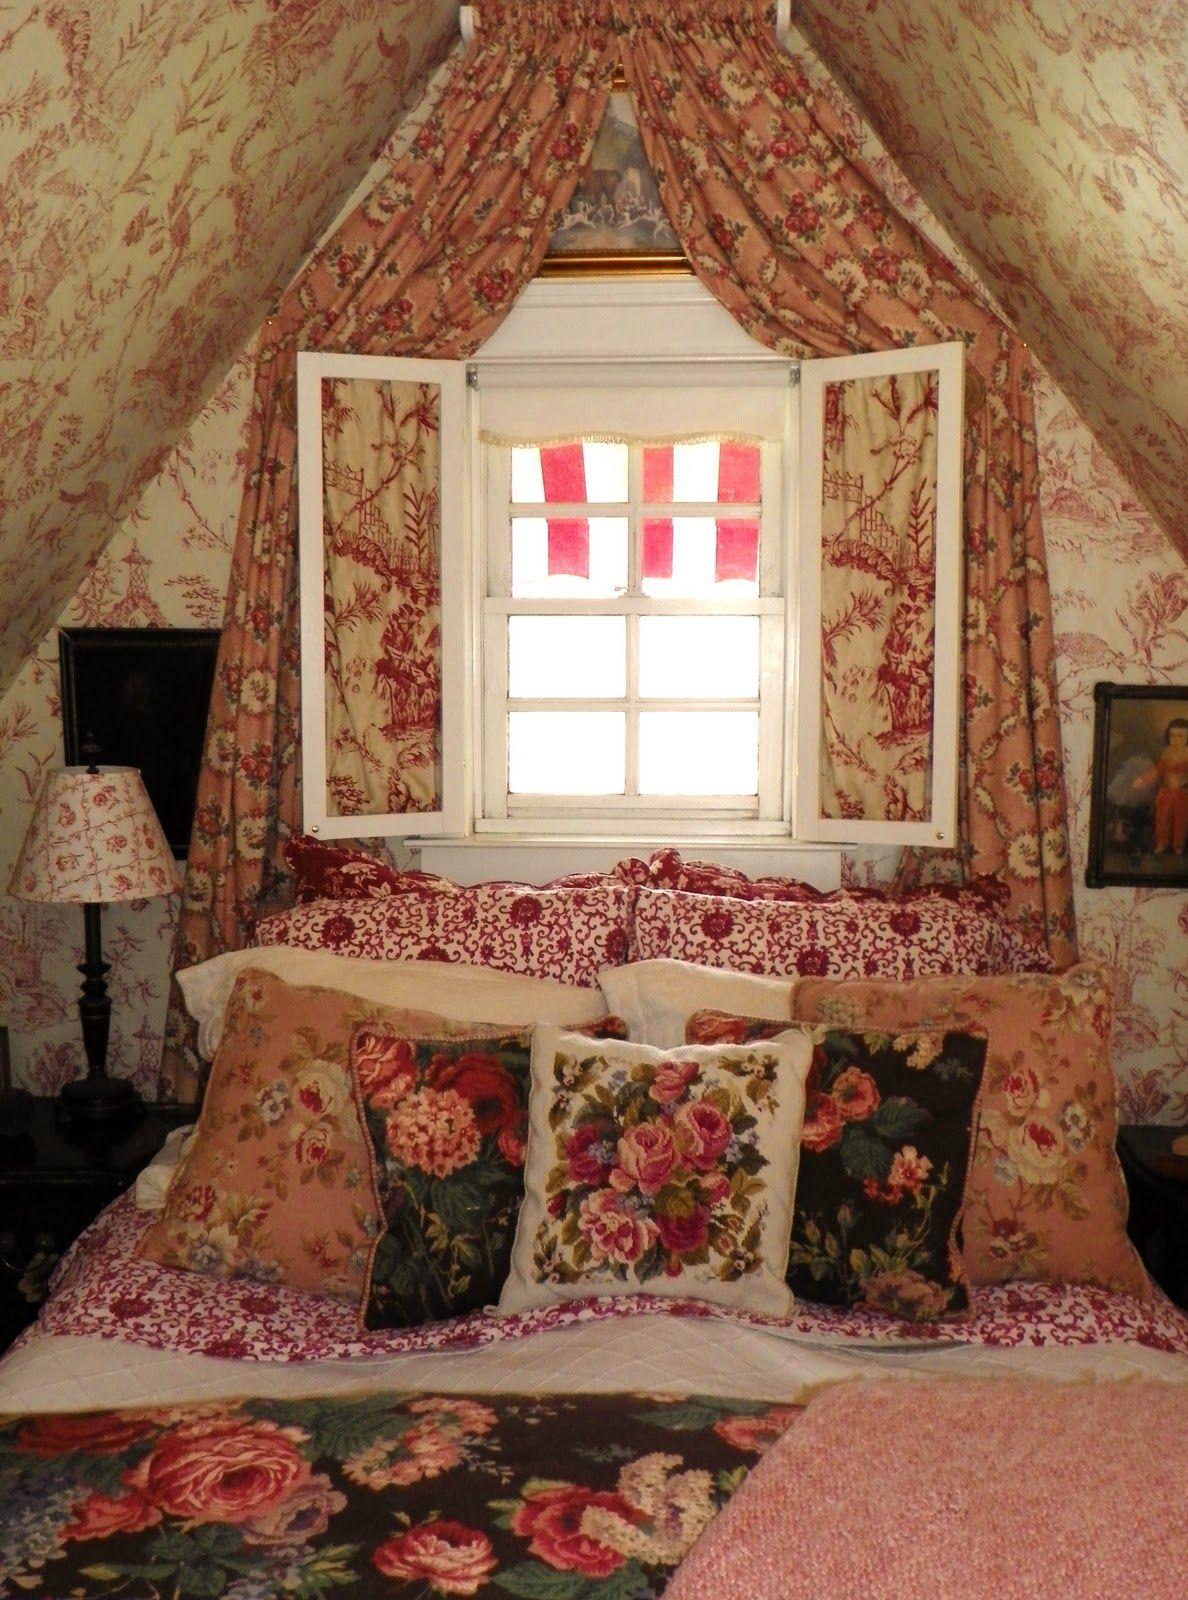 darling bedroom under the eaves nature treasure pinterest schlafzimmer haus und g stezimmer. Black Bedroom Furniture Sets. Home Design Ideas